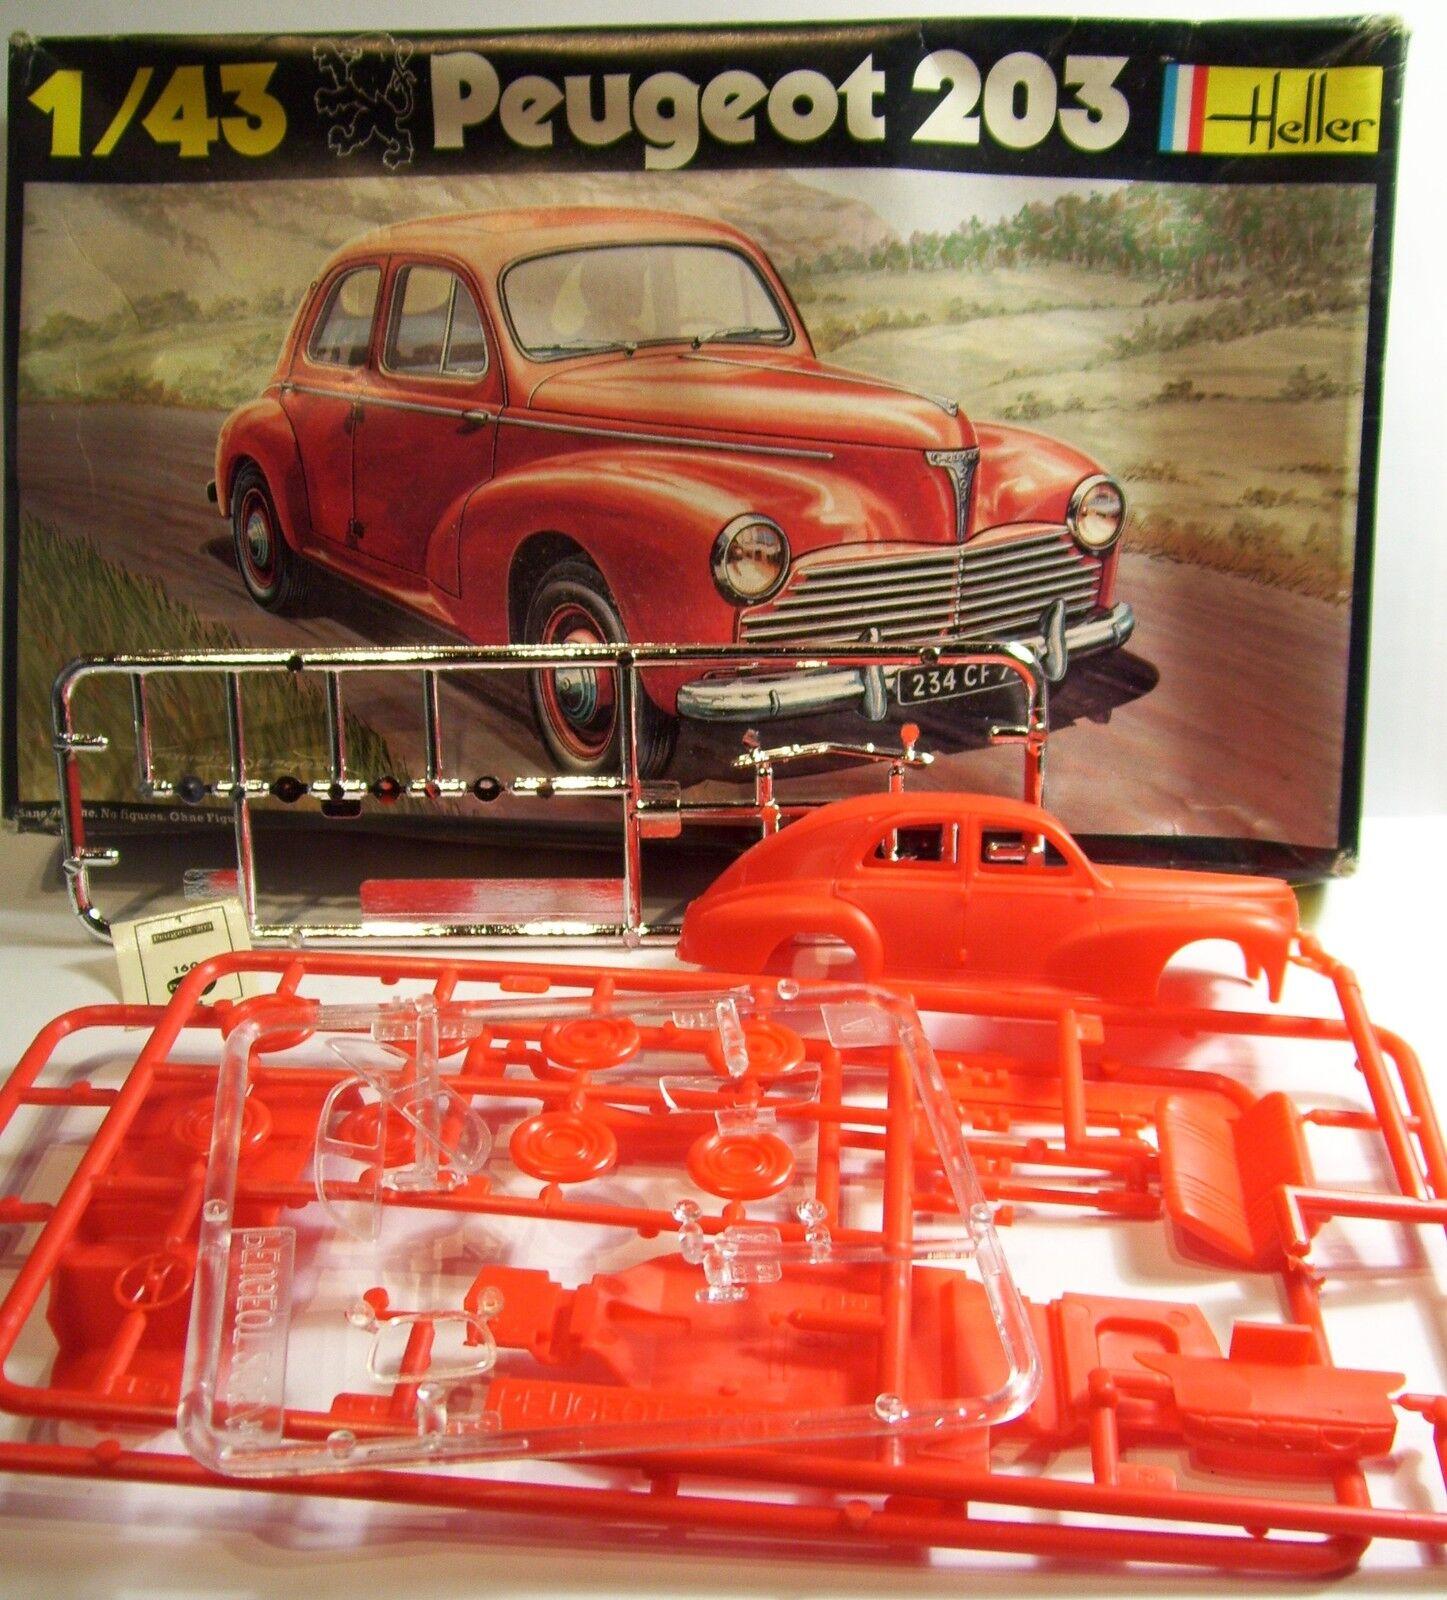 HELLER PEUGEOT 203 MAQUETTE PLASTIQUE KIT COMPLET A MONTER REF 160 1 43 IN BOX